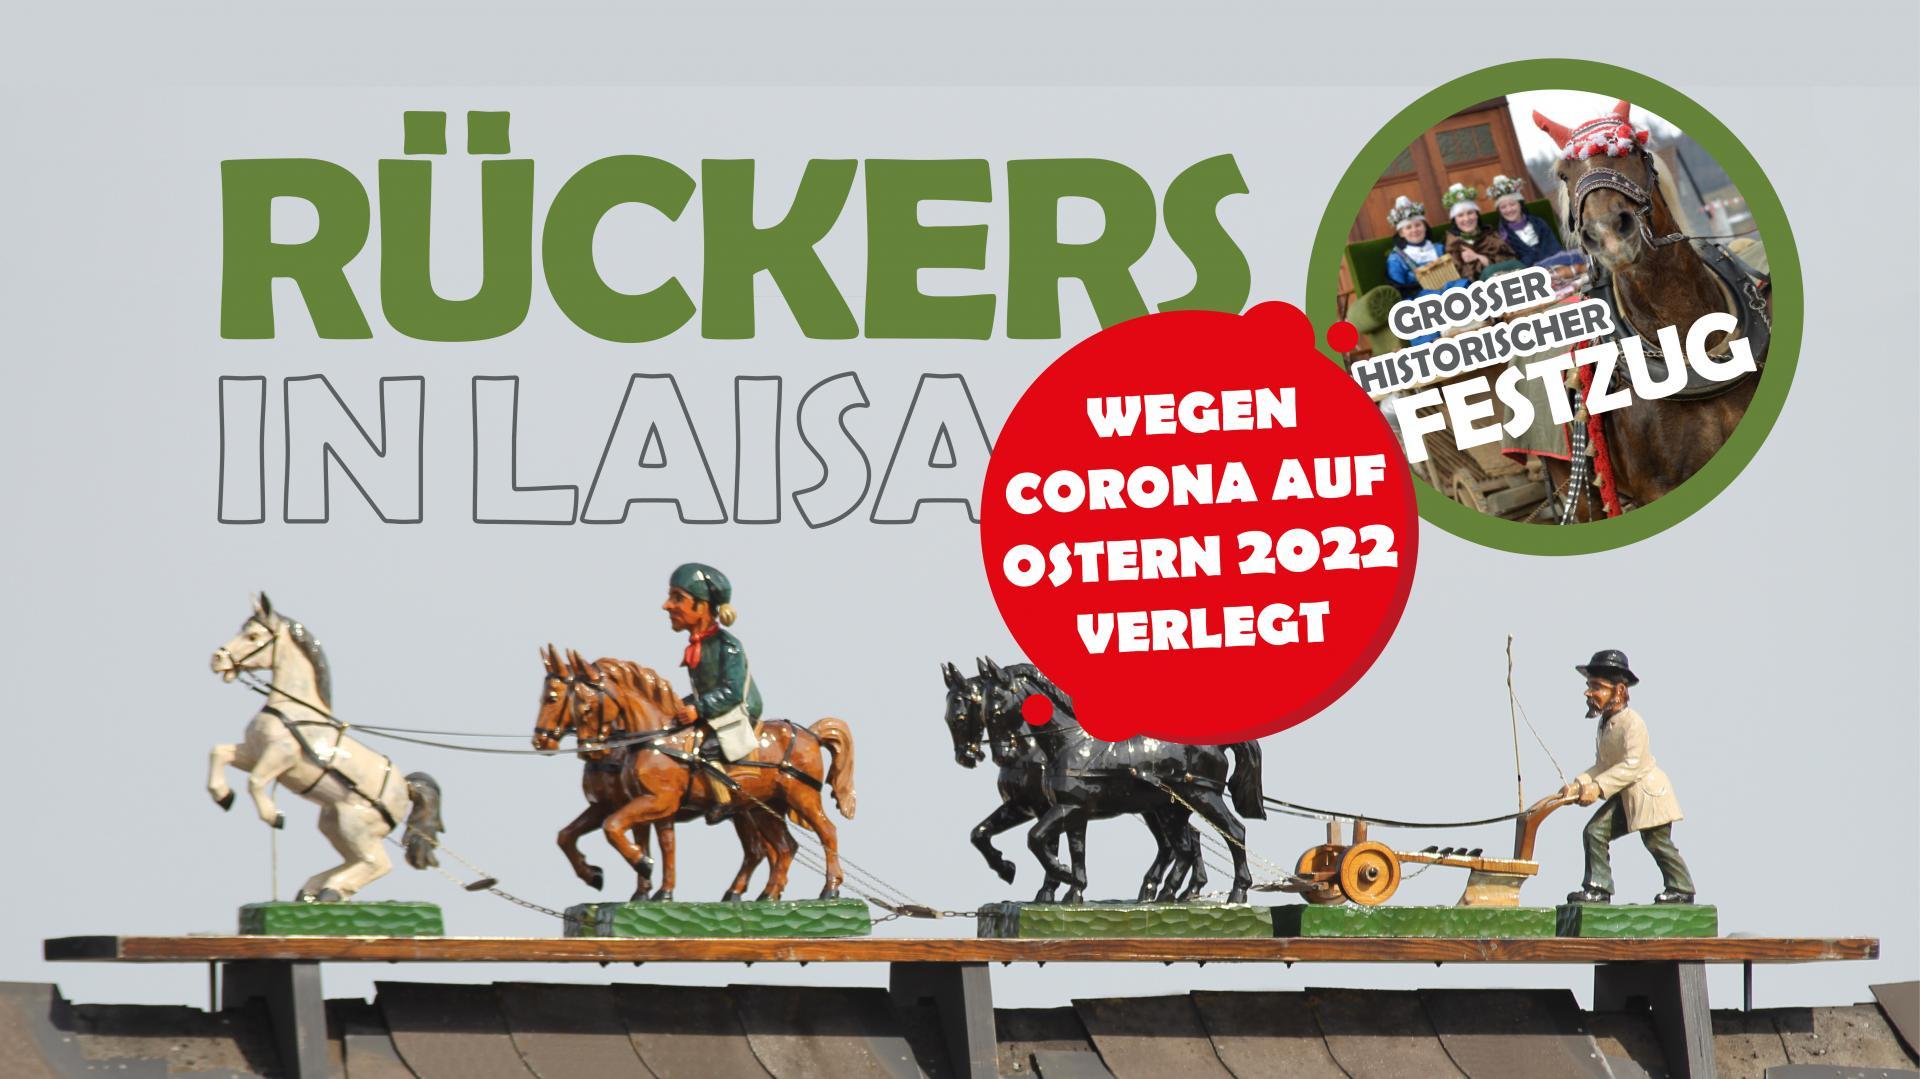 Rückers2022